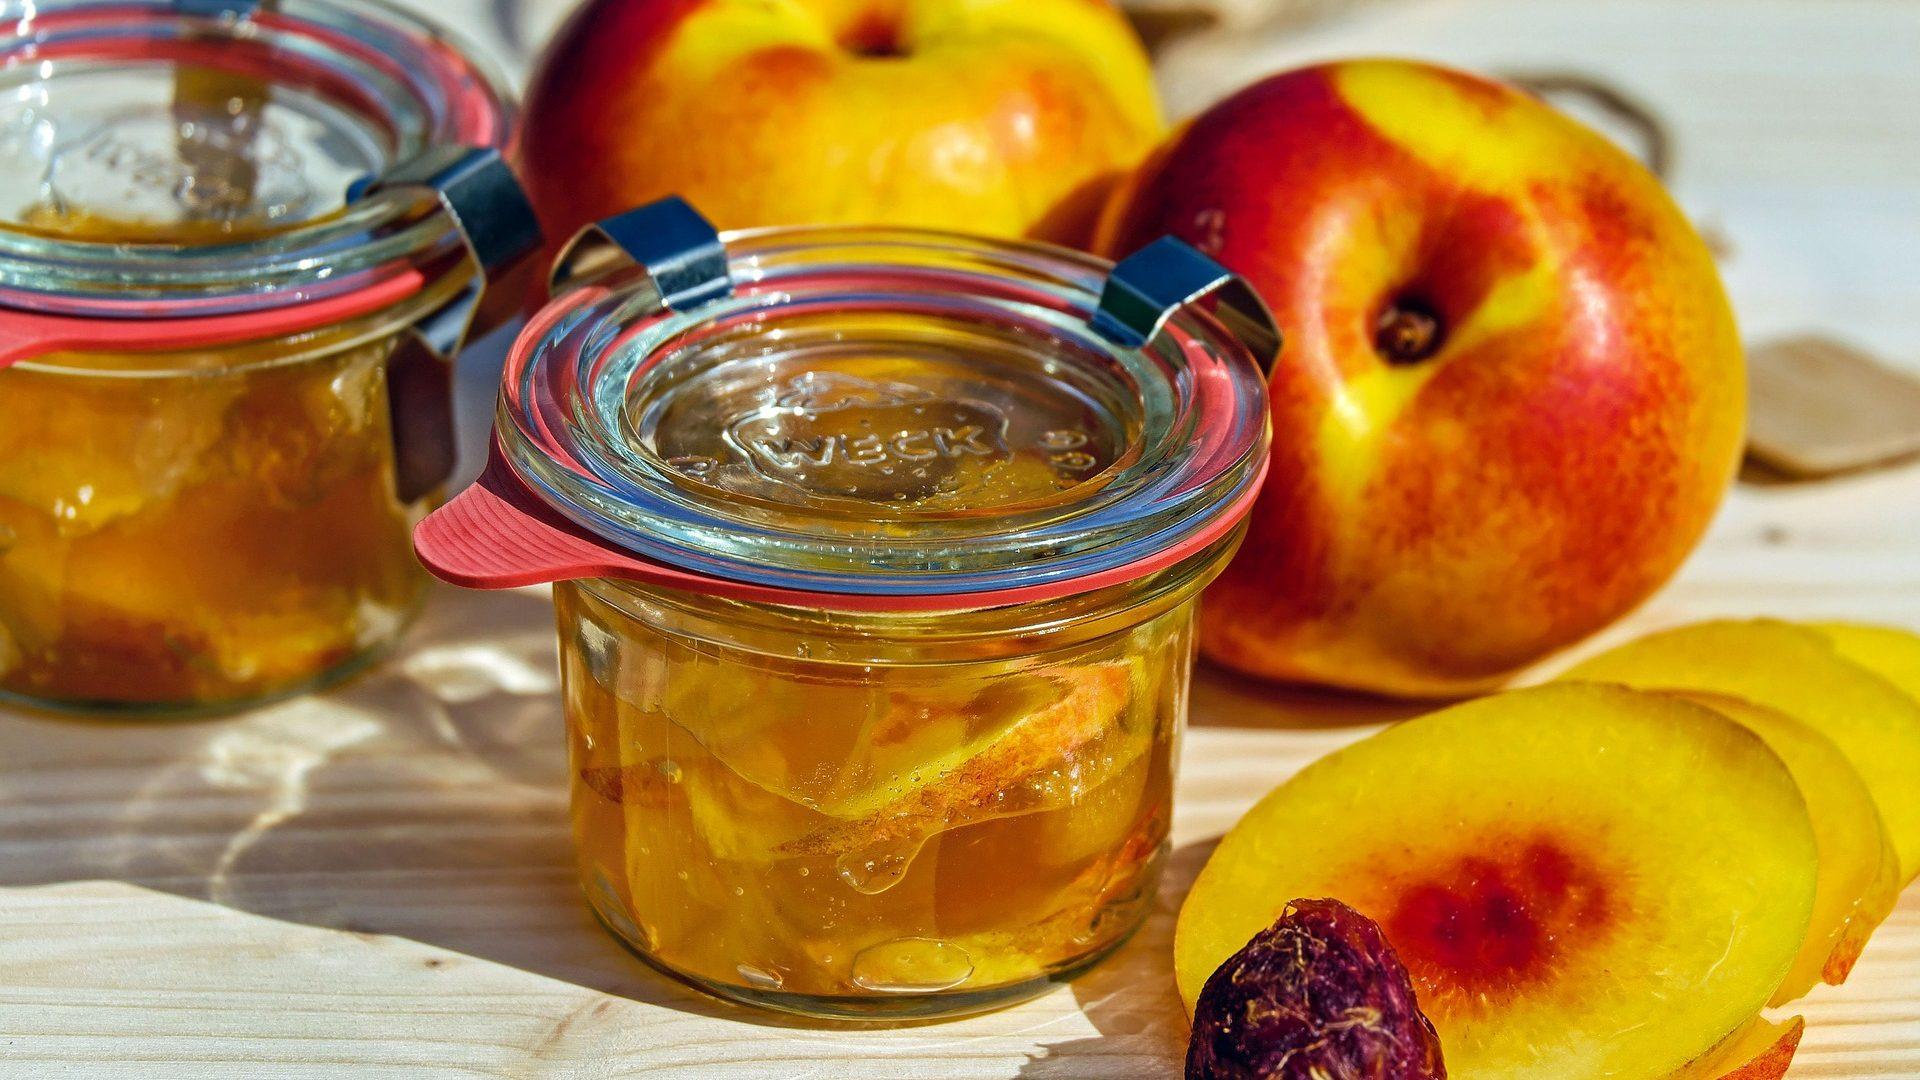 jam nectarine apricots-1678918_1920